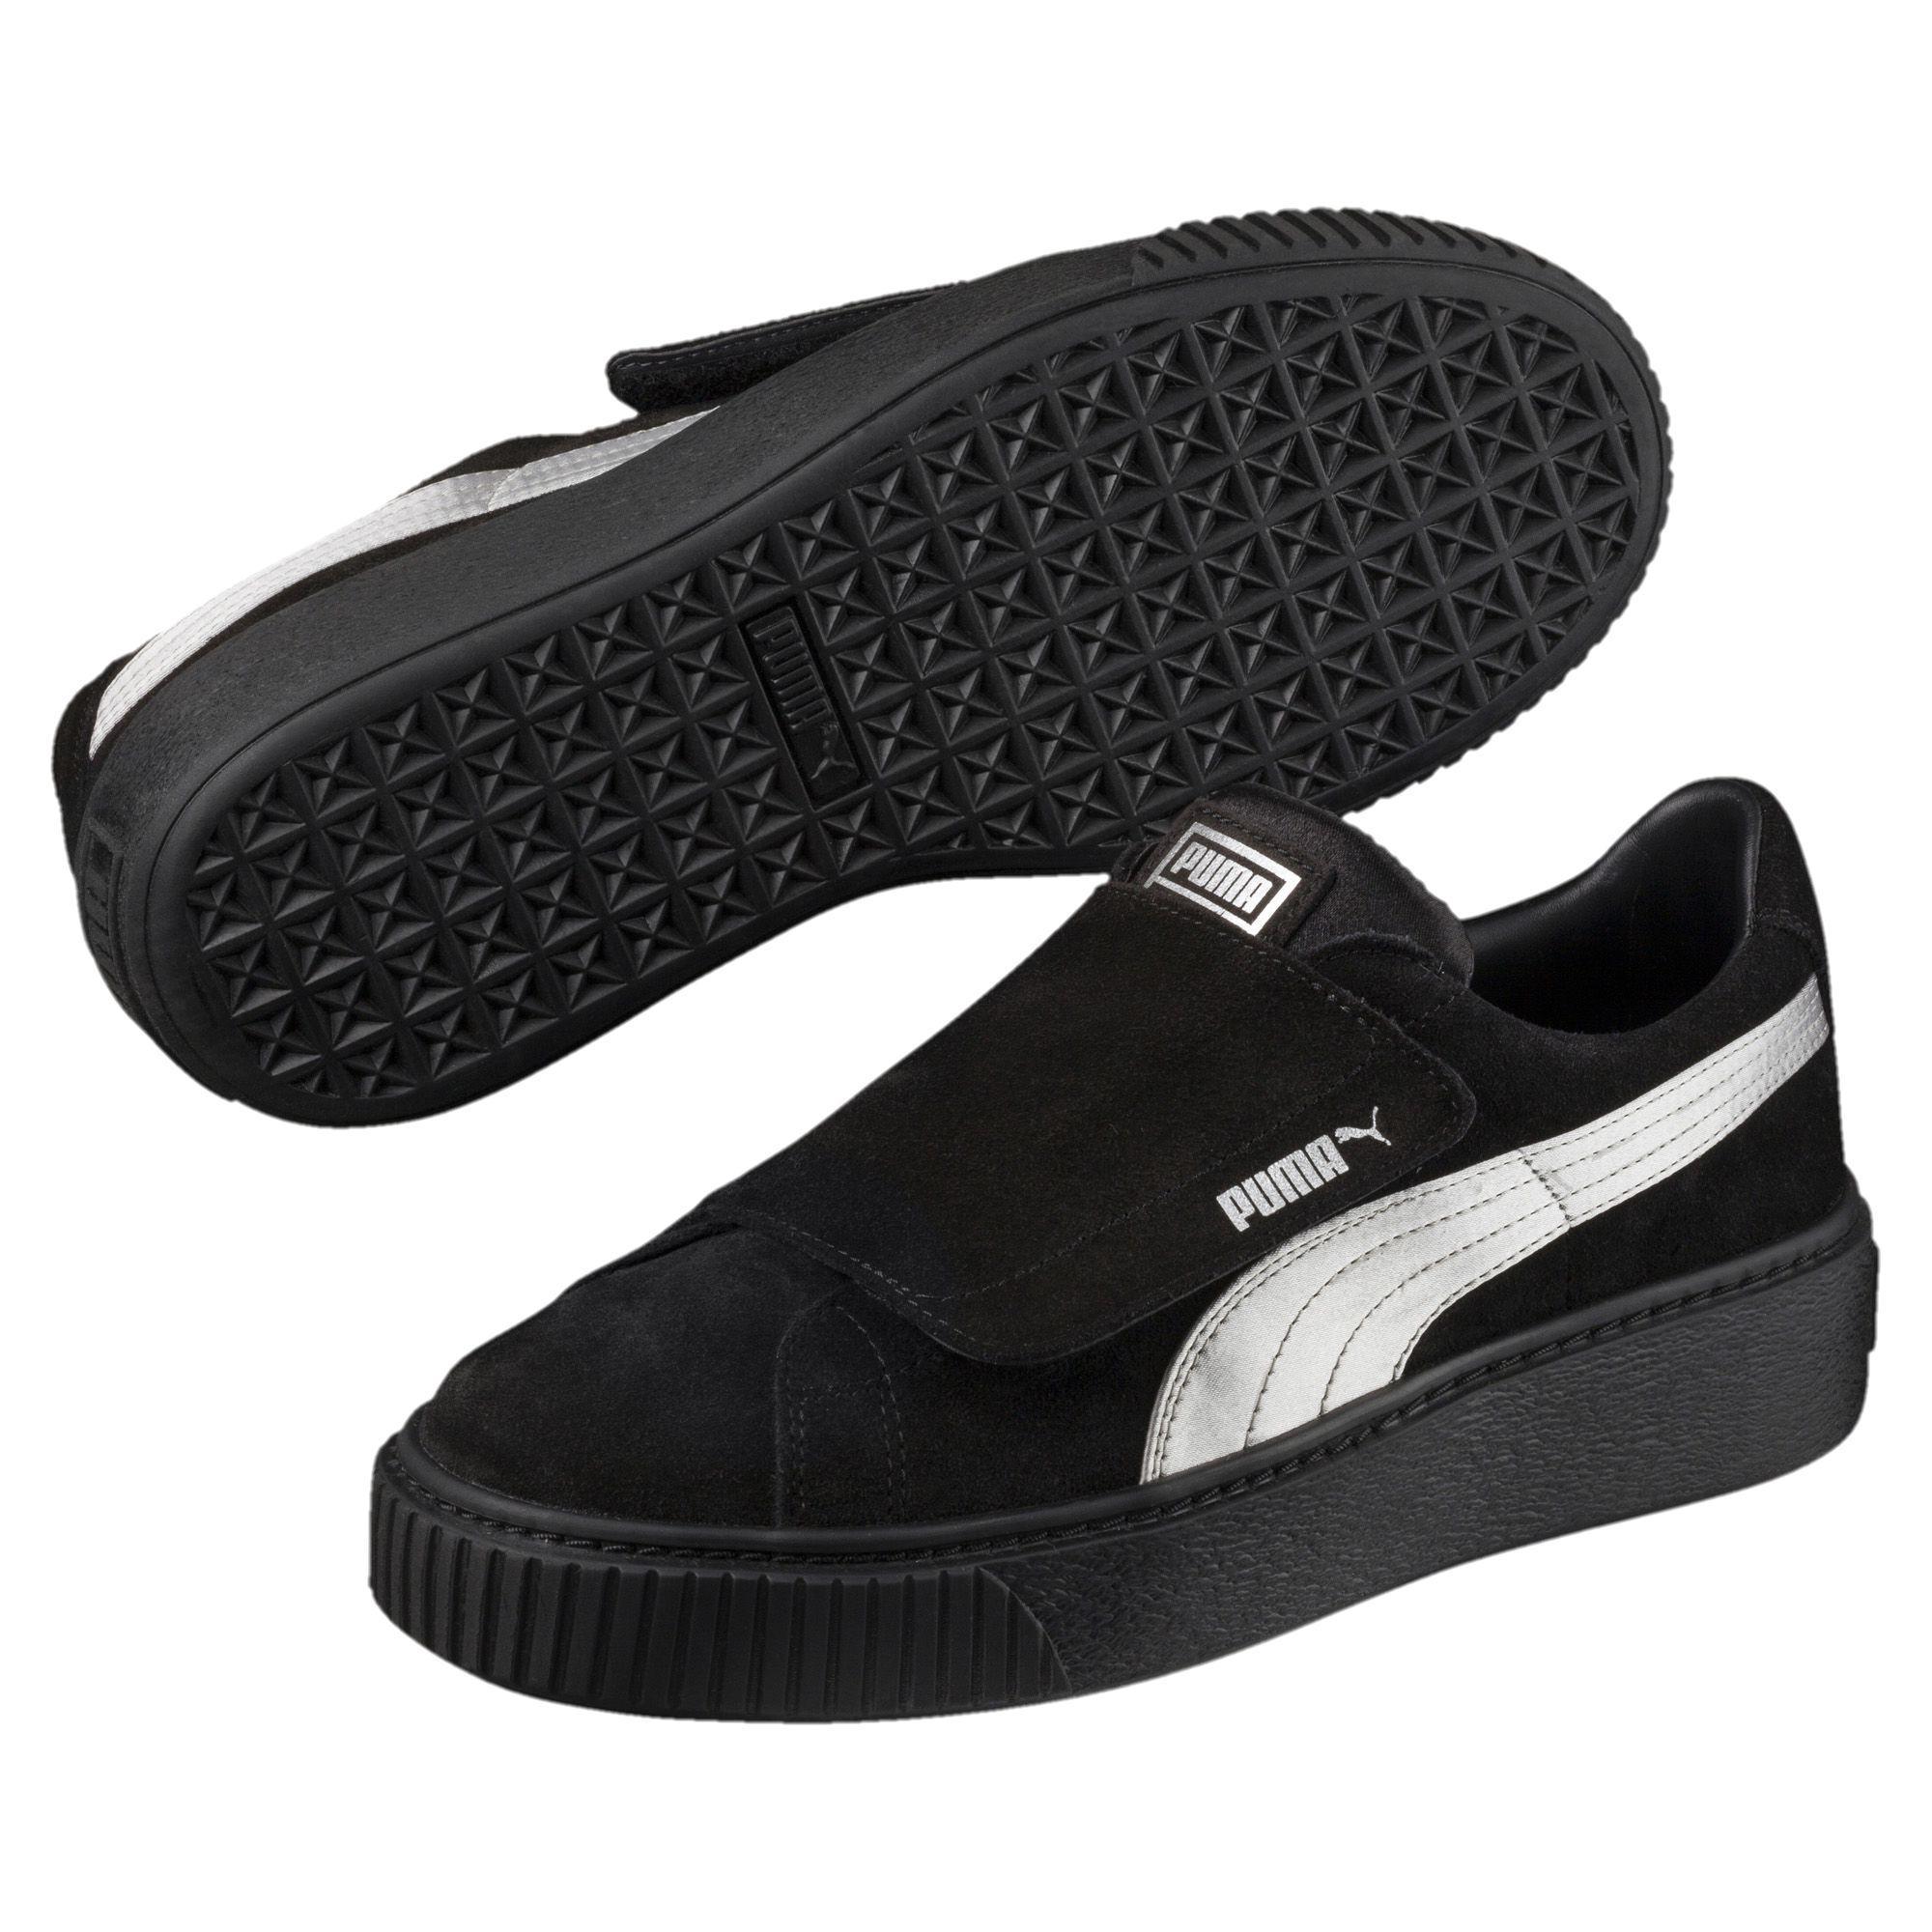 f0d2bc5d7a99 Lyst - PUMA Platform Strap Satin Ep Women s Sneakers in Black